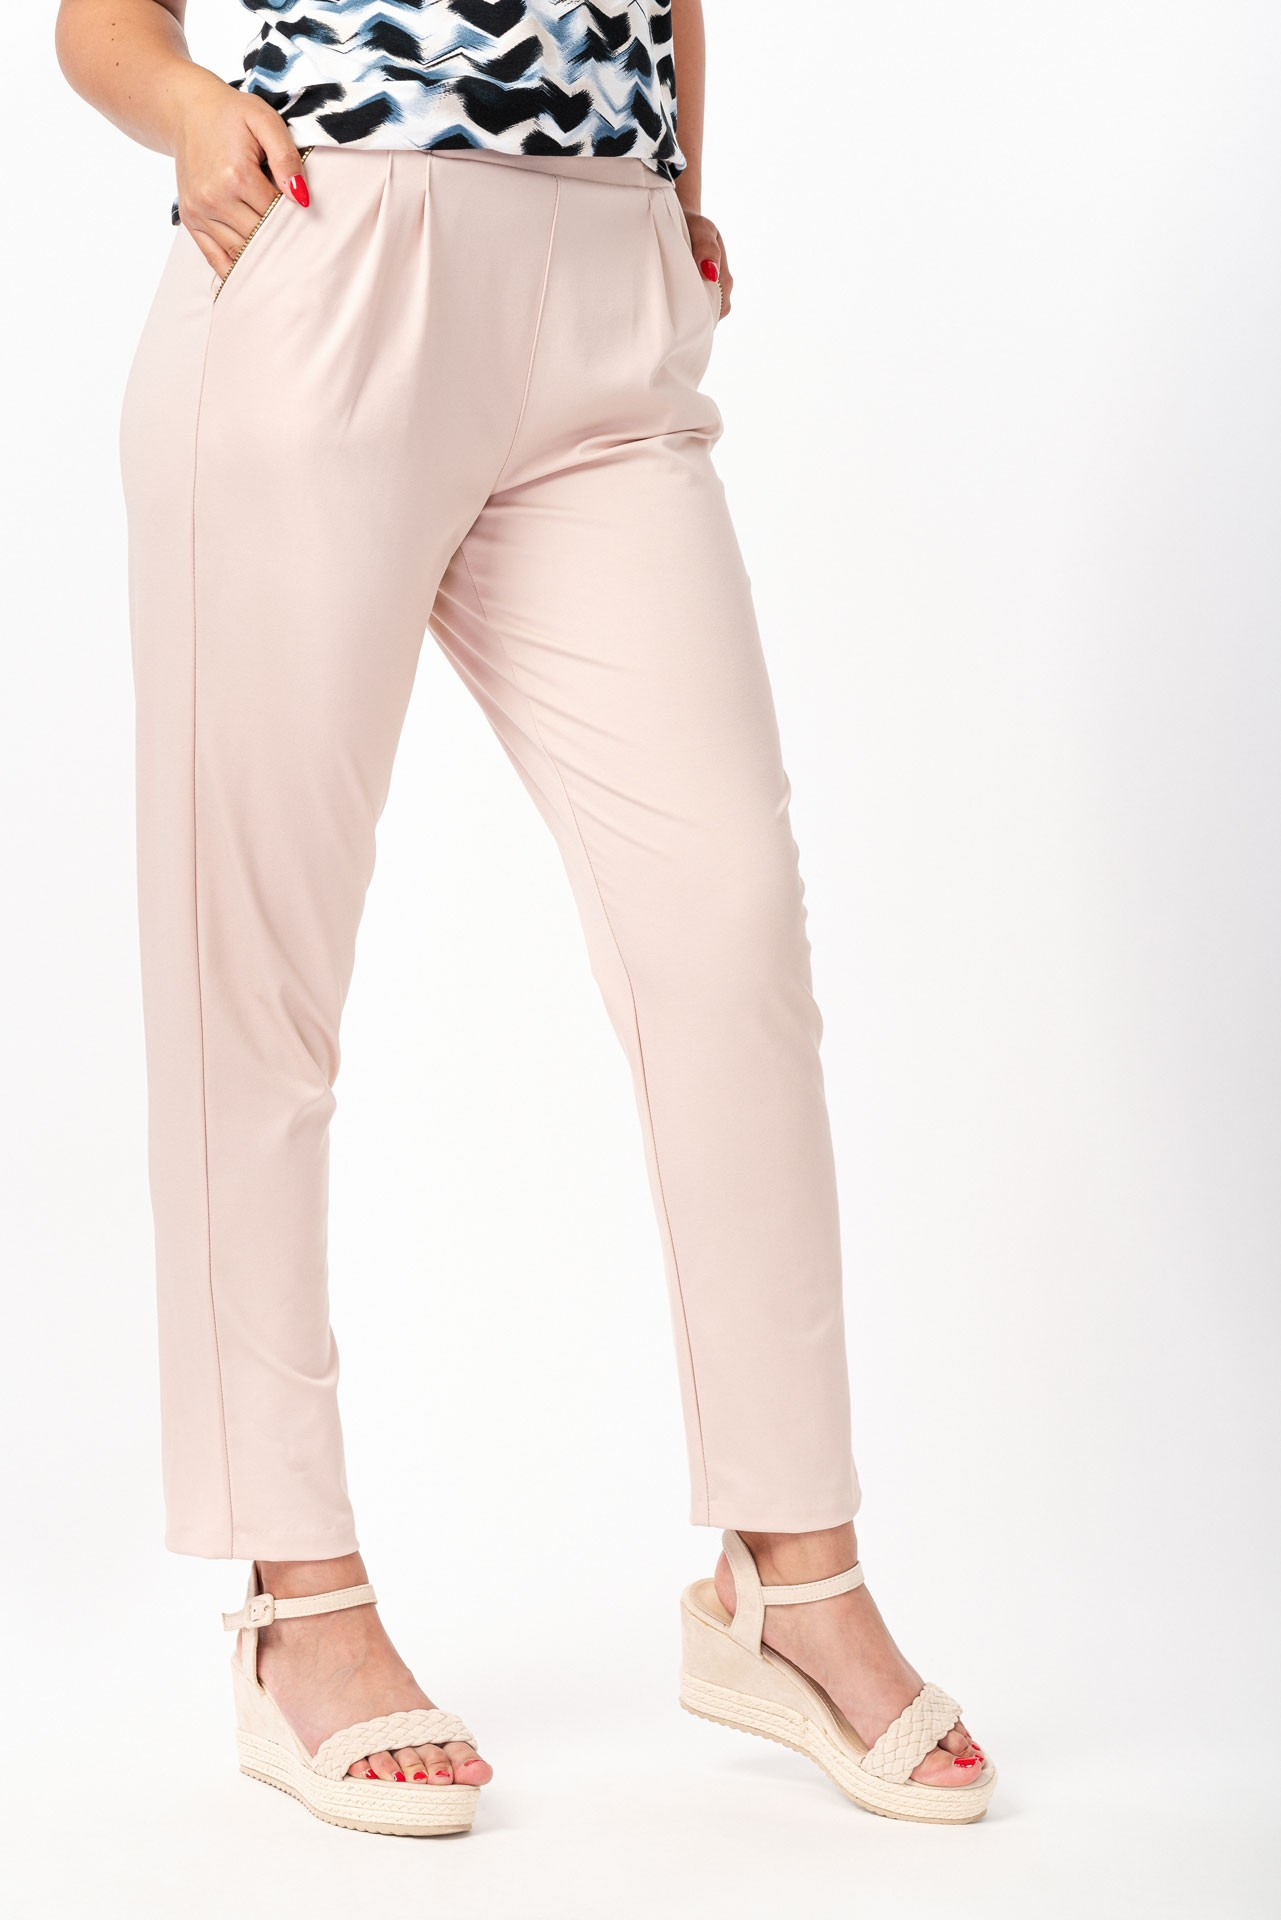 Dámské kalhoty GOMA II